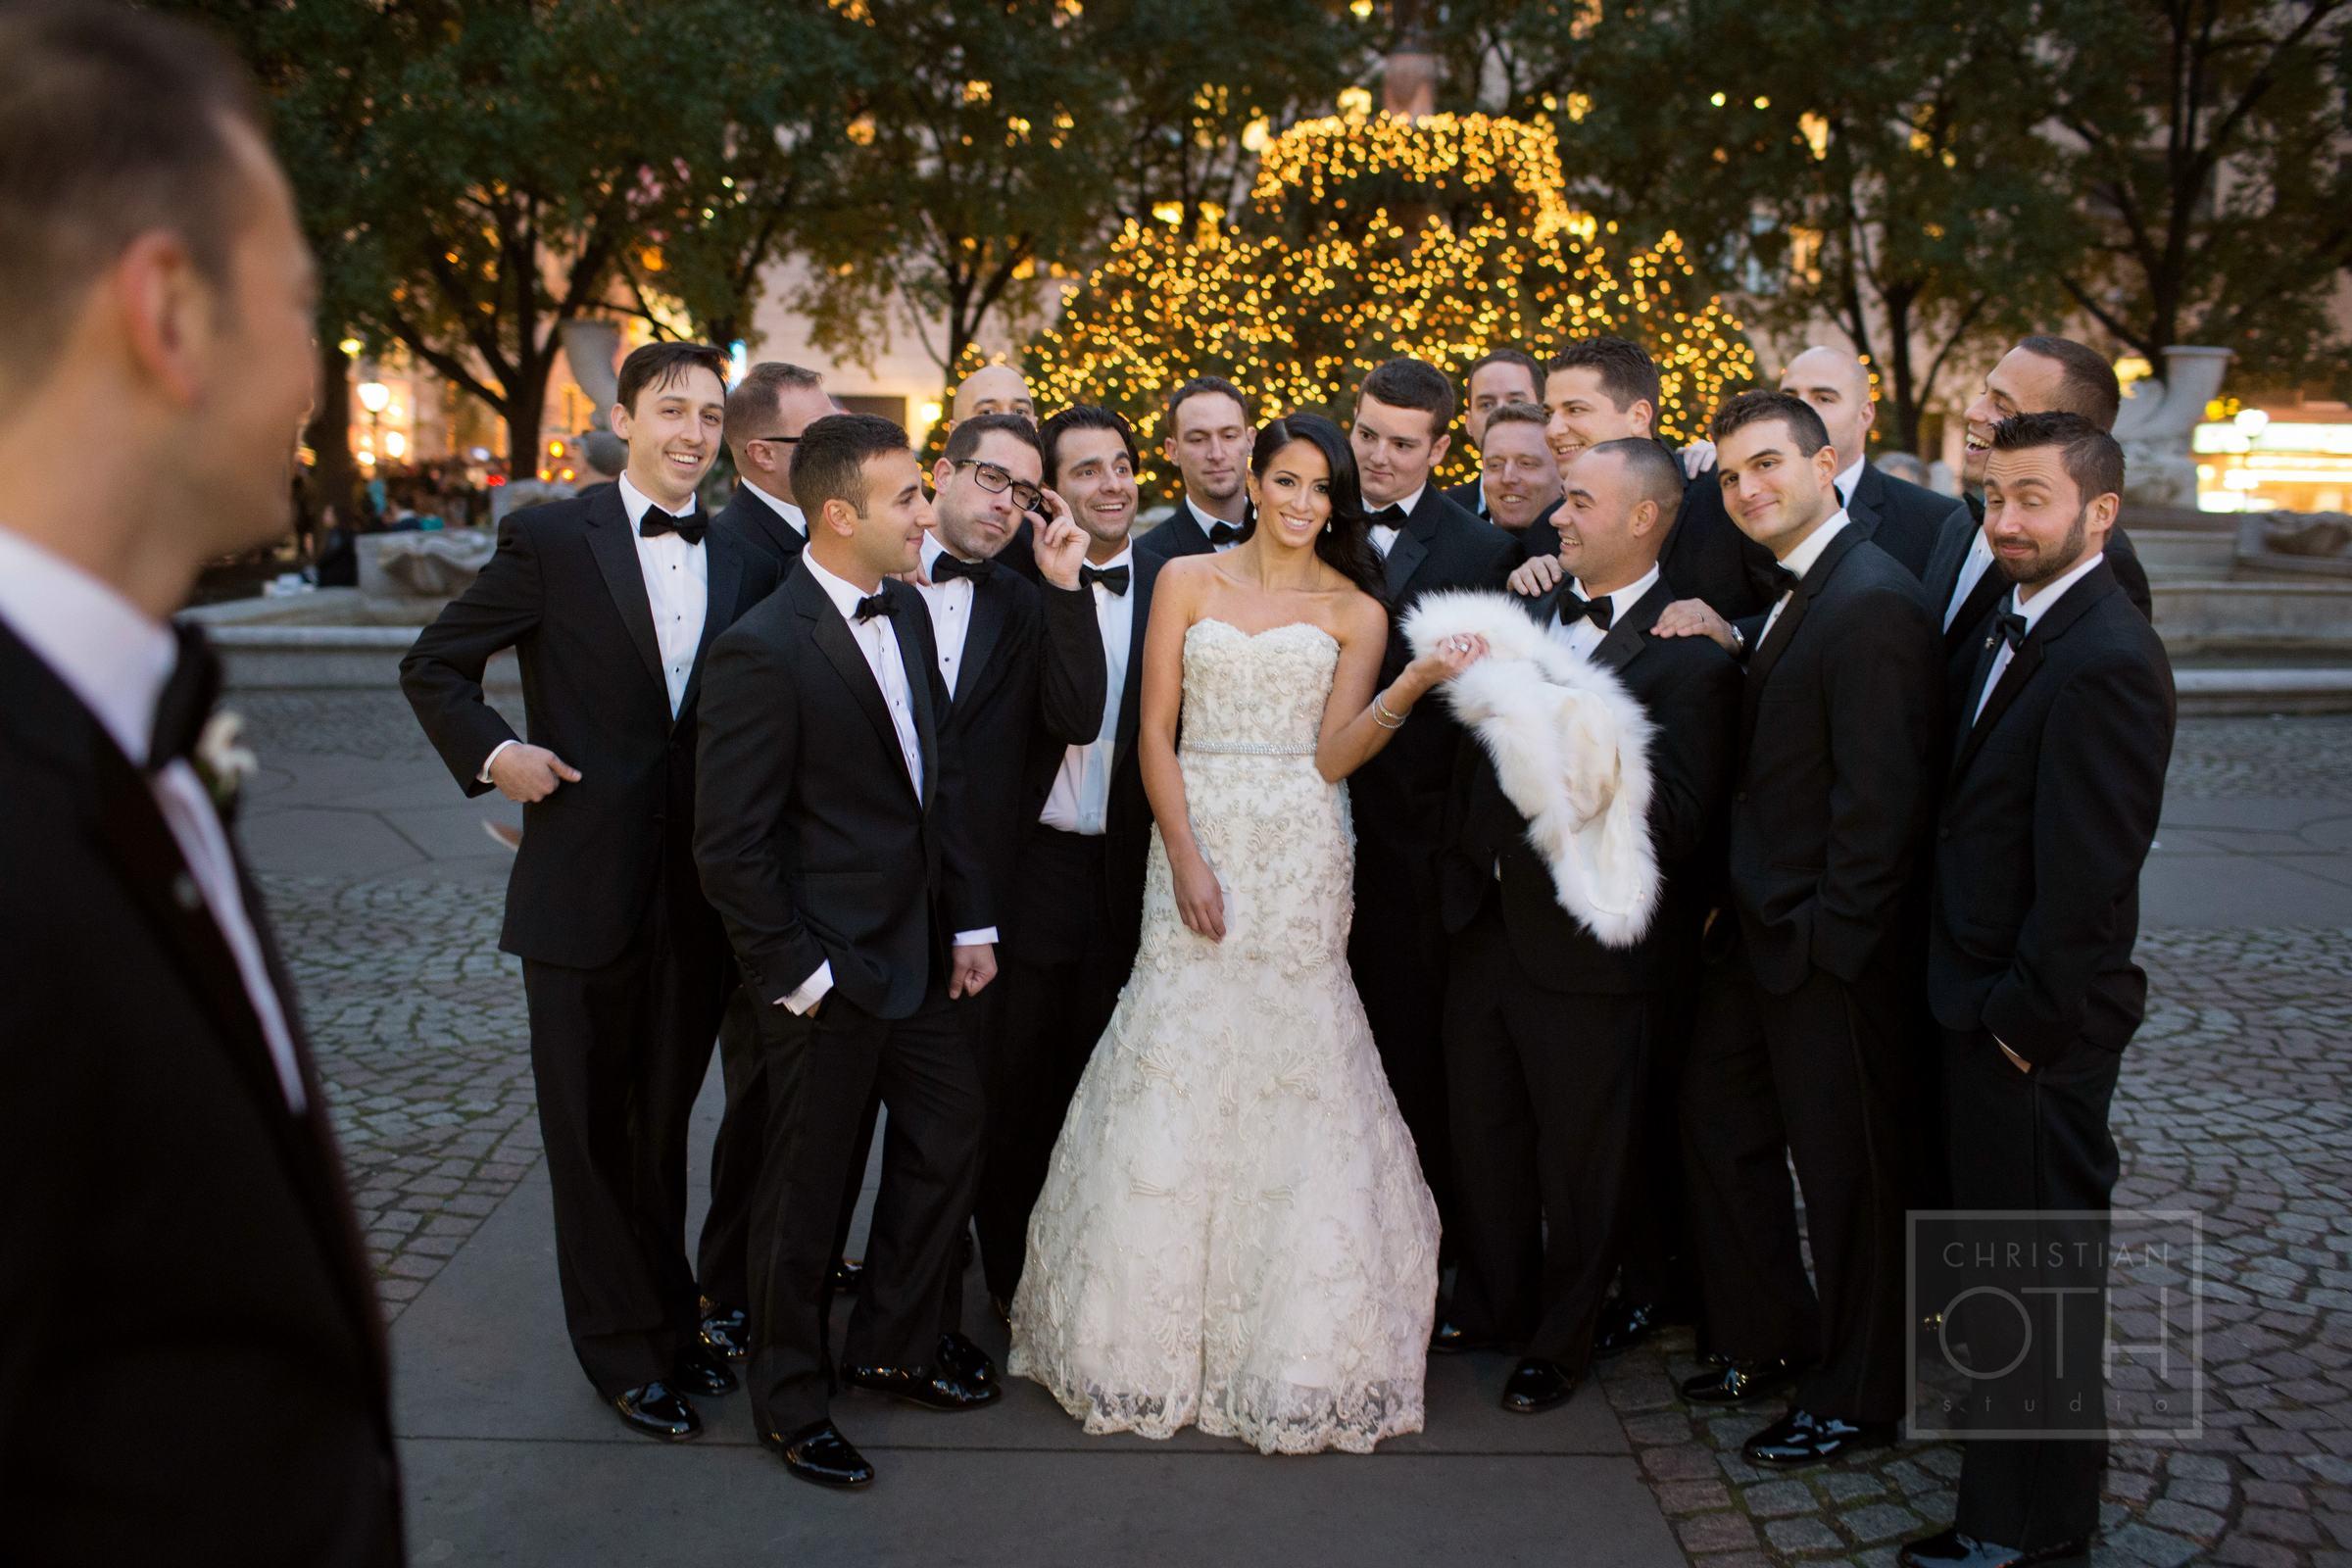 Ceci_New_York_Custom_Invitation_Pierre__City_ Destination_Wedding_Luxury_Personalized_Ceci_Style_Bride_Rose_Gold_Foil_Stamping75.JPG